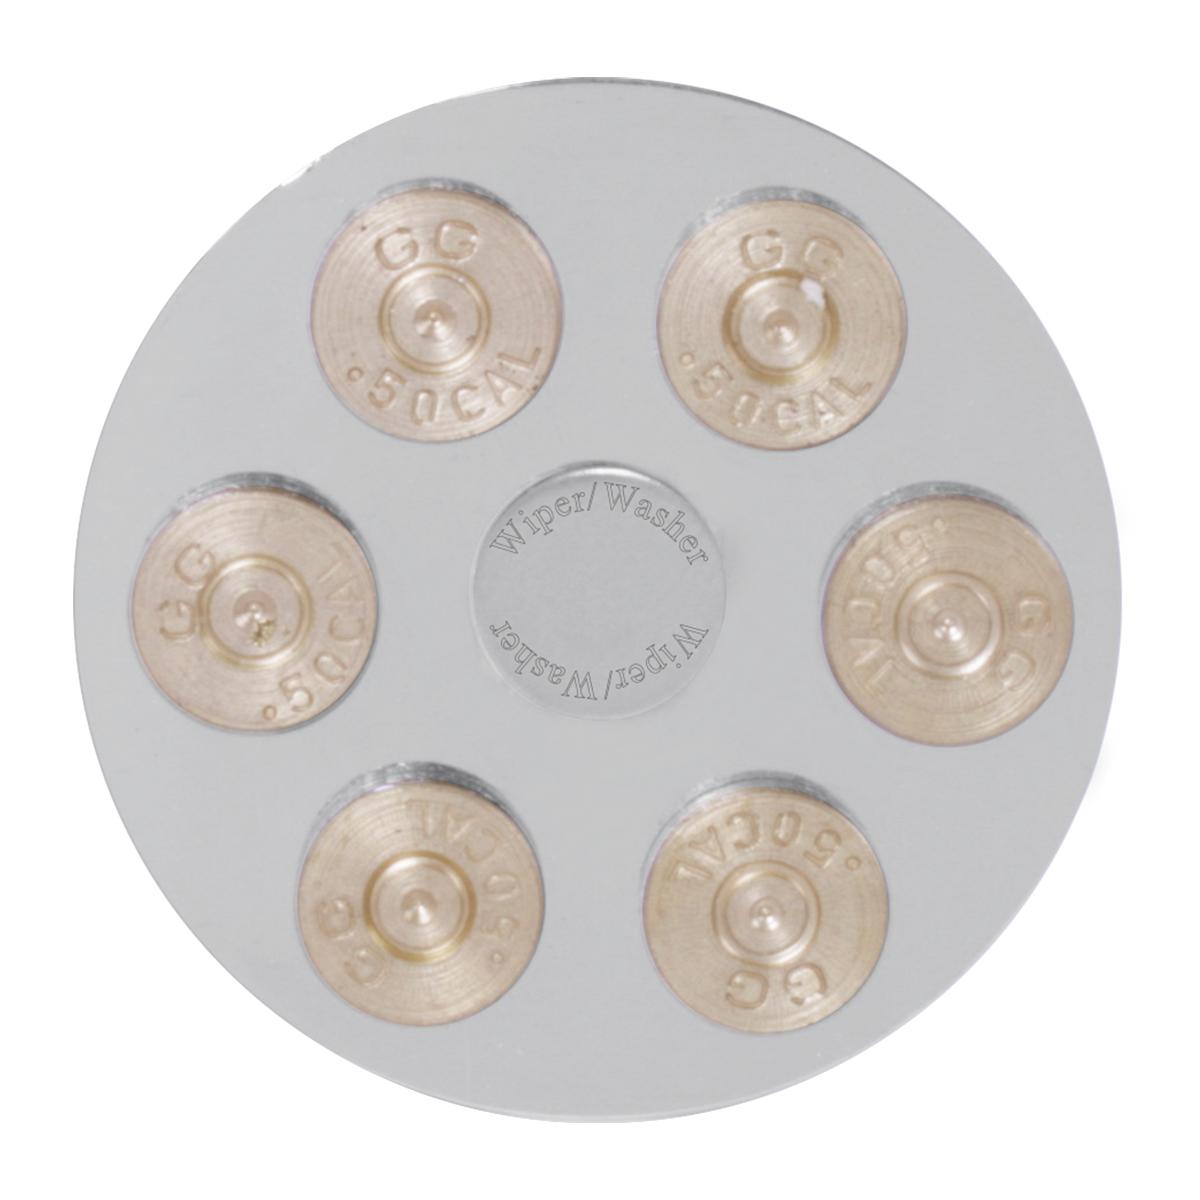 95613 Gun Cylinder Dashboard Control Knob w/ Wiper/Washer Script